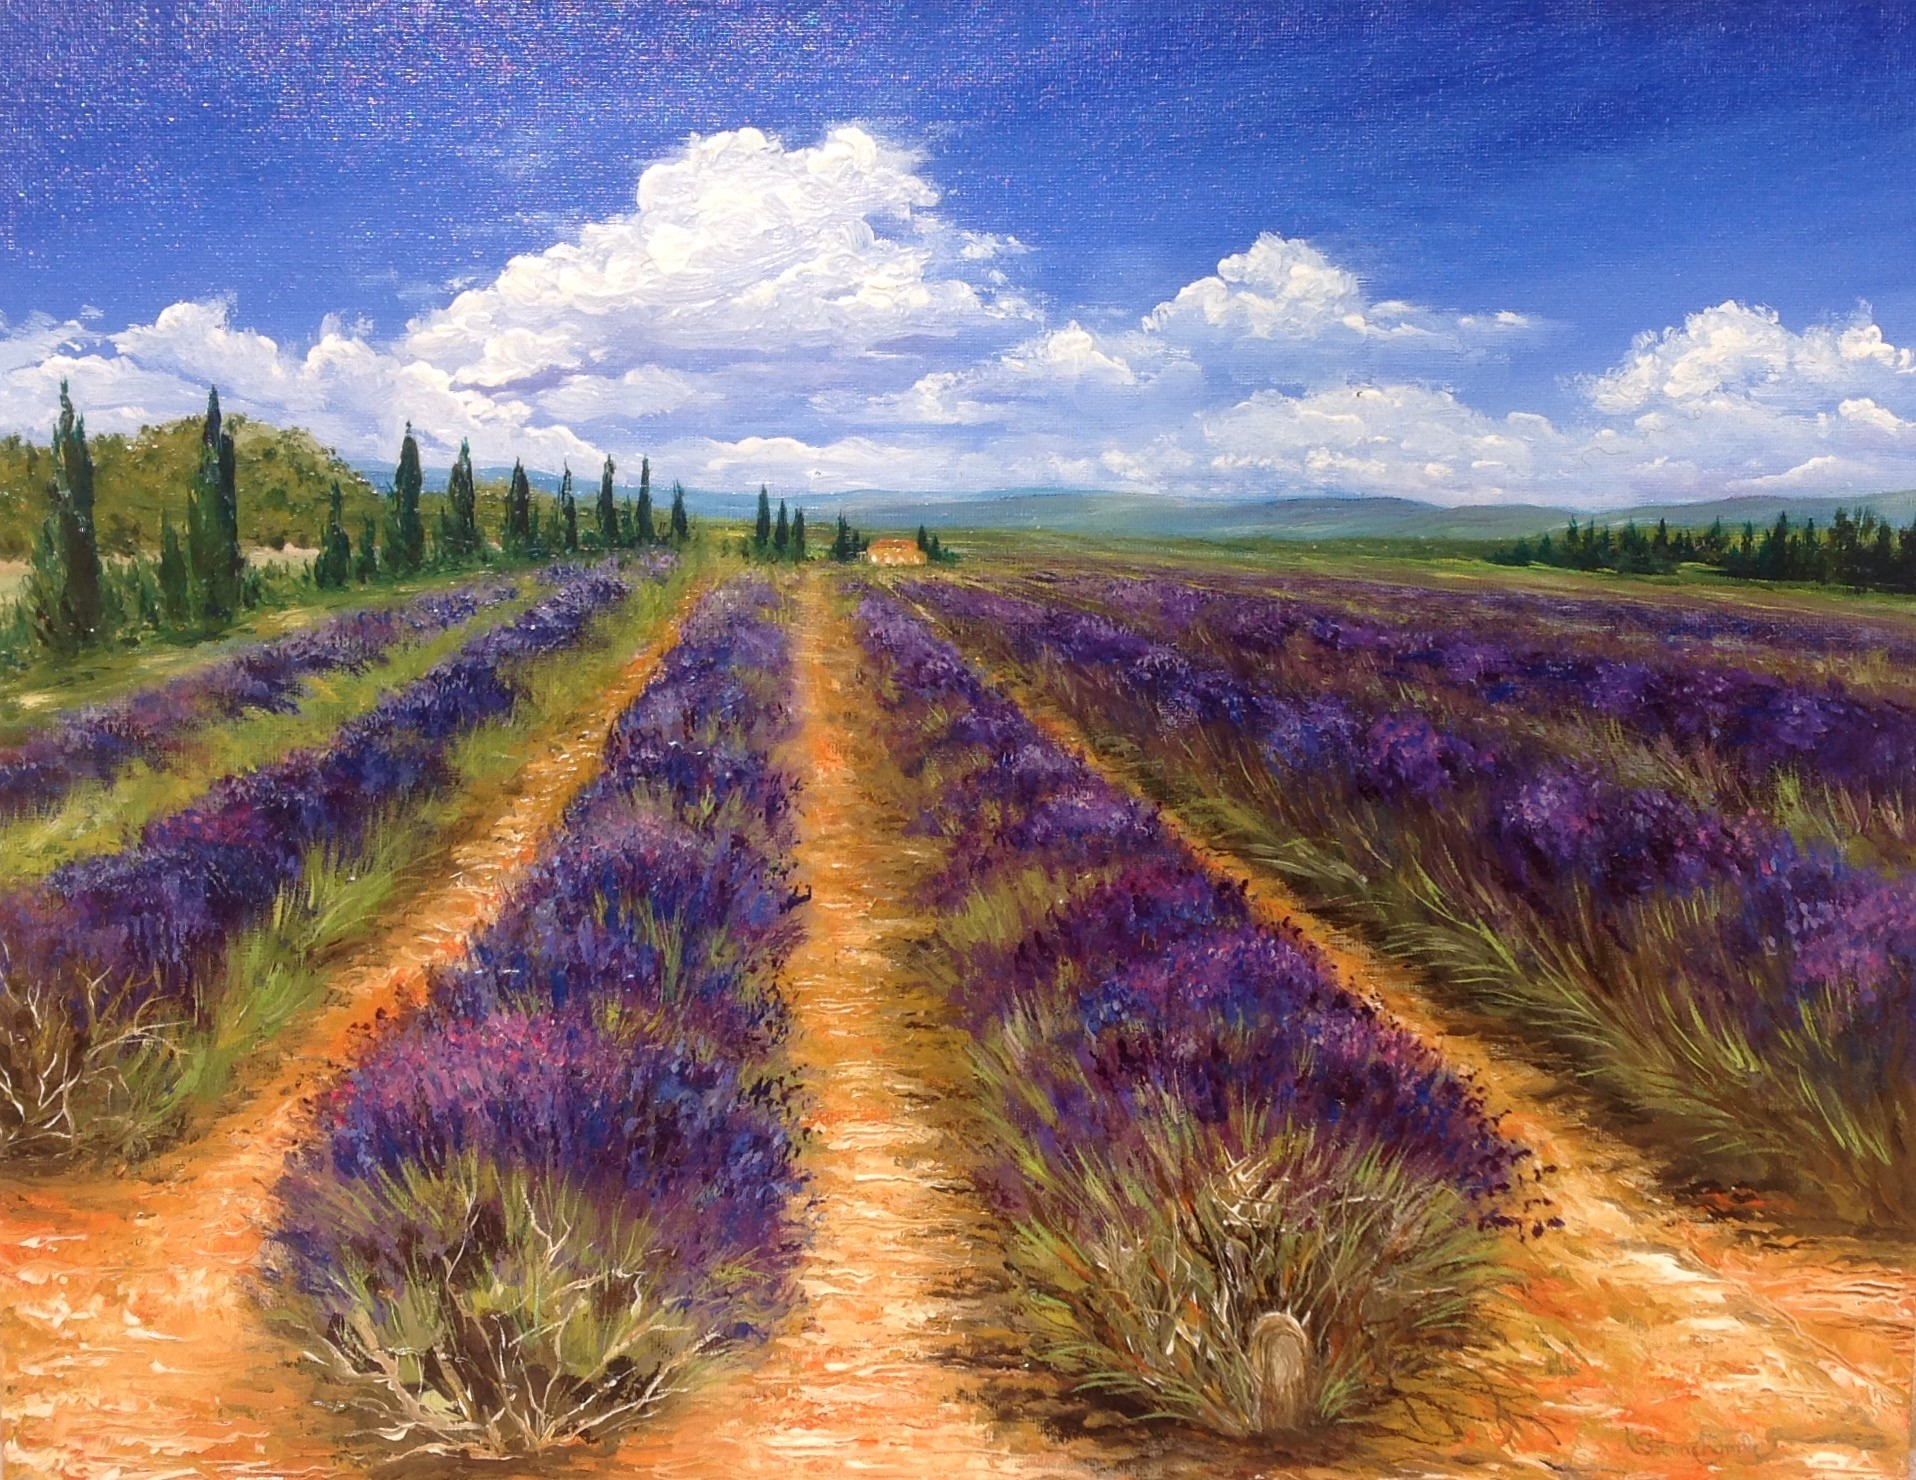 Shirley Stinchcombe - Lavender Fields